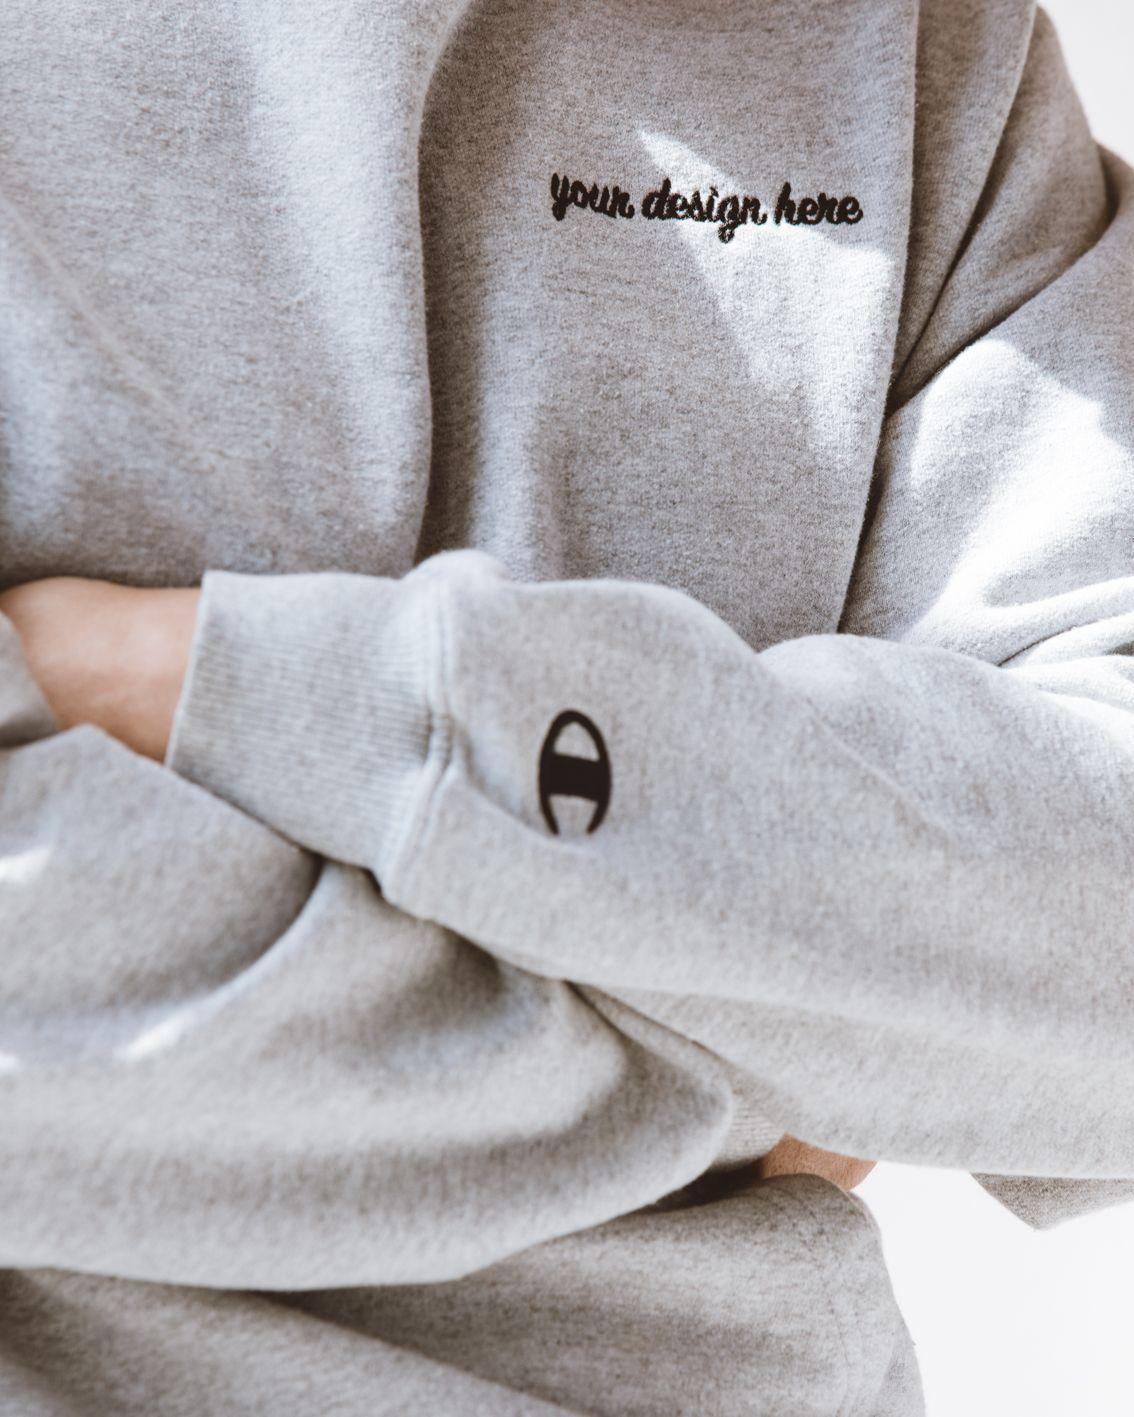 Personalized Men S Champion Sweatshirt Sweatshirts Mens Champion Sweatshirt Champion Sweatshirt [ 1417 x 1134 Pixel ]